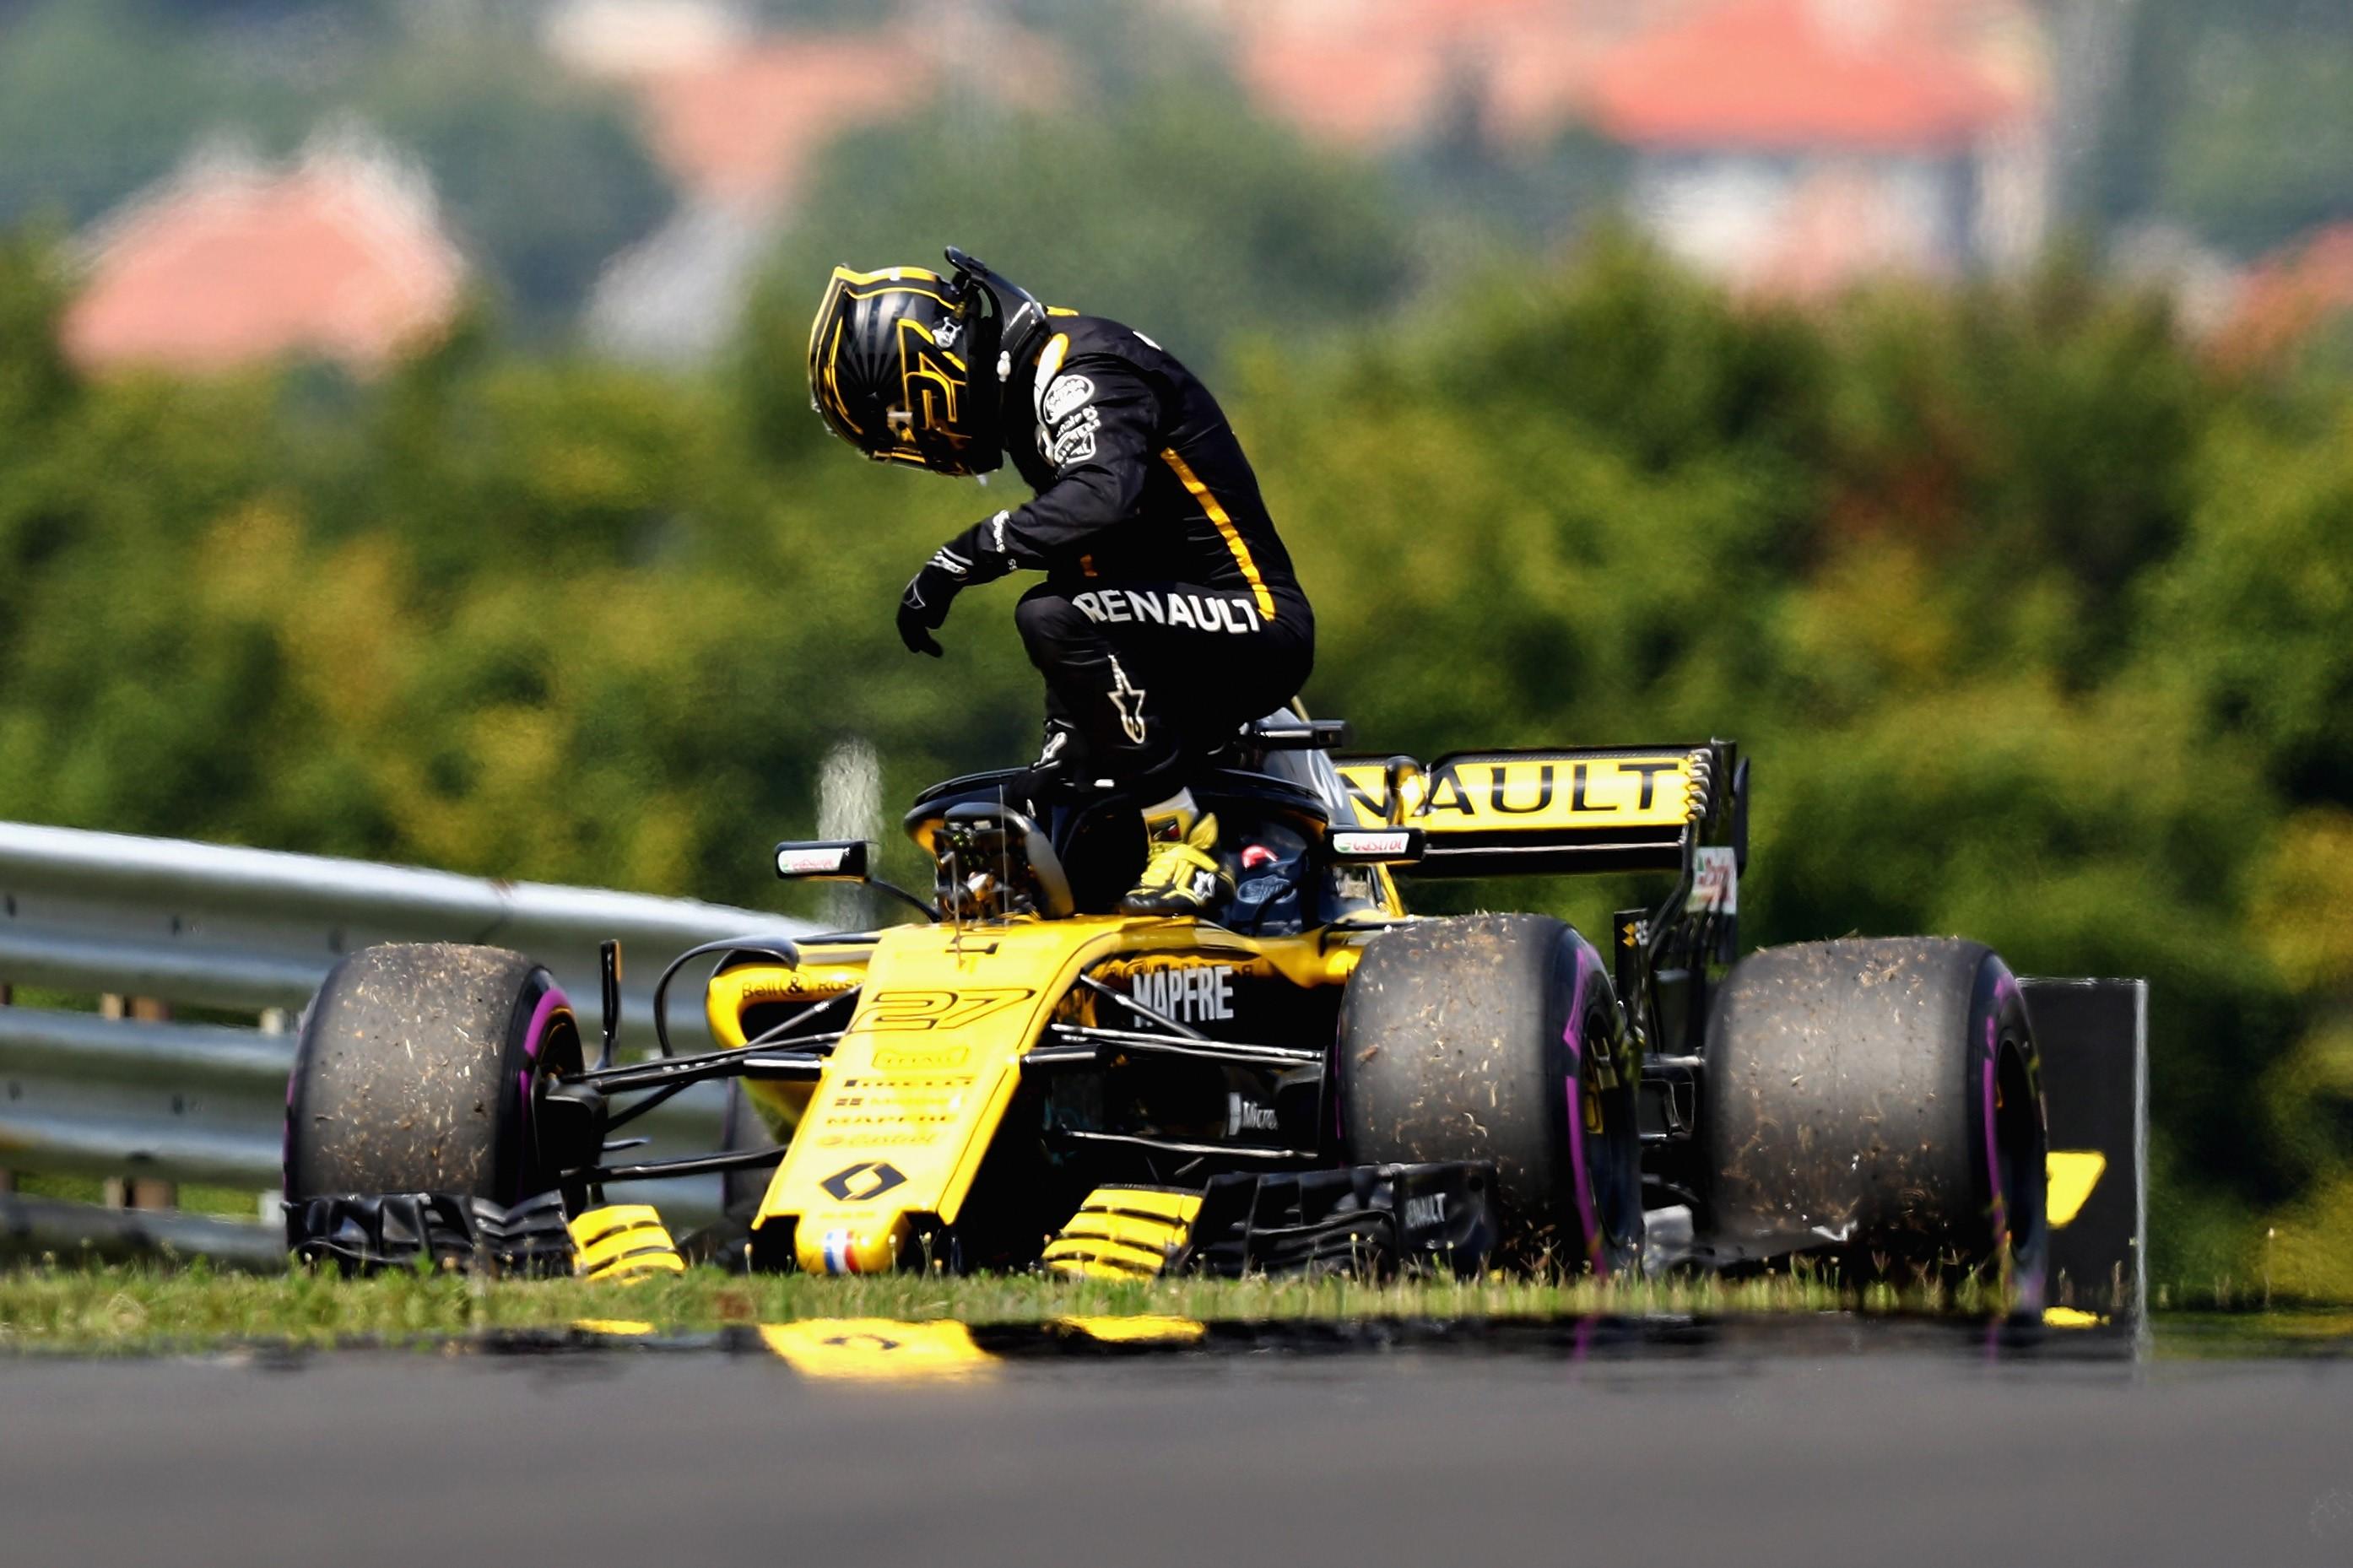 Nico Hülkenberg (Renault) au Grand Prix de Hongrie 2018